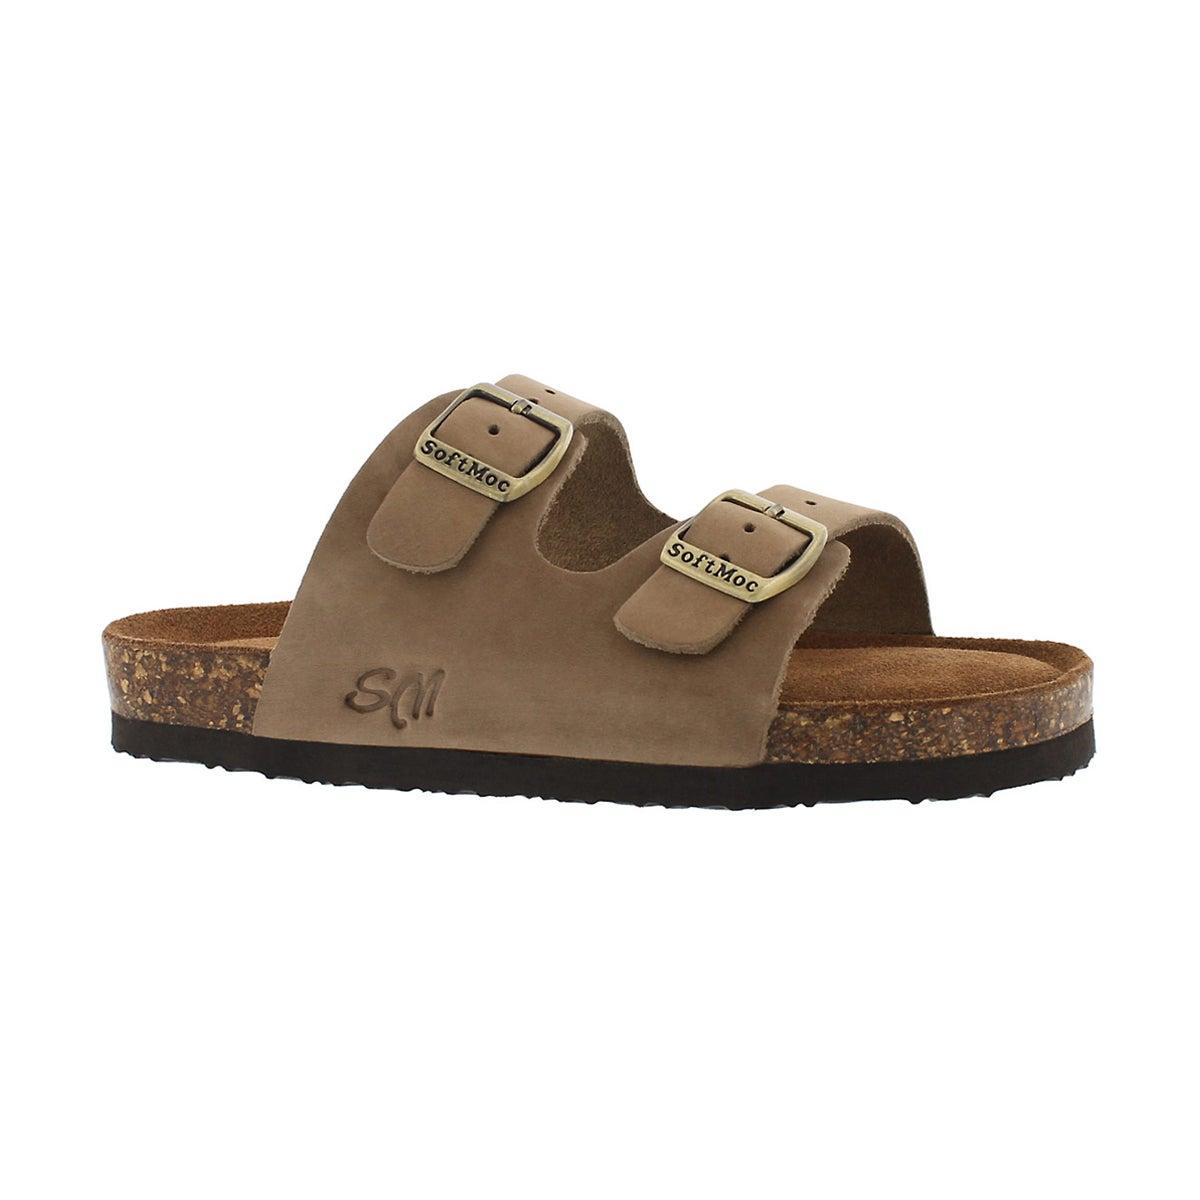 Kds Alberta 5 tpe crz memory foam sandal